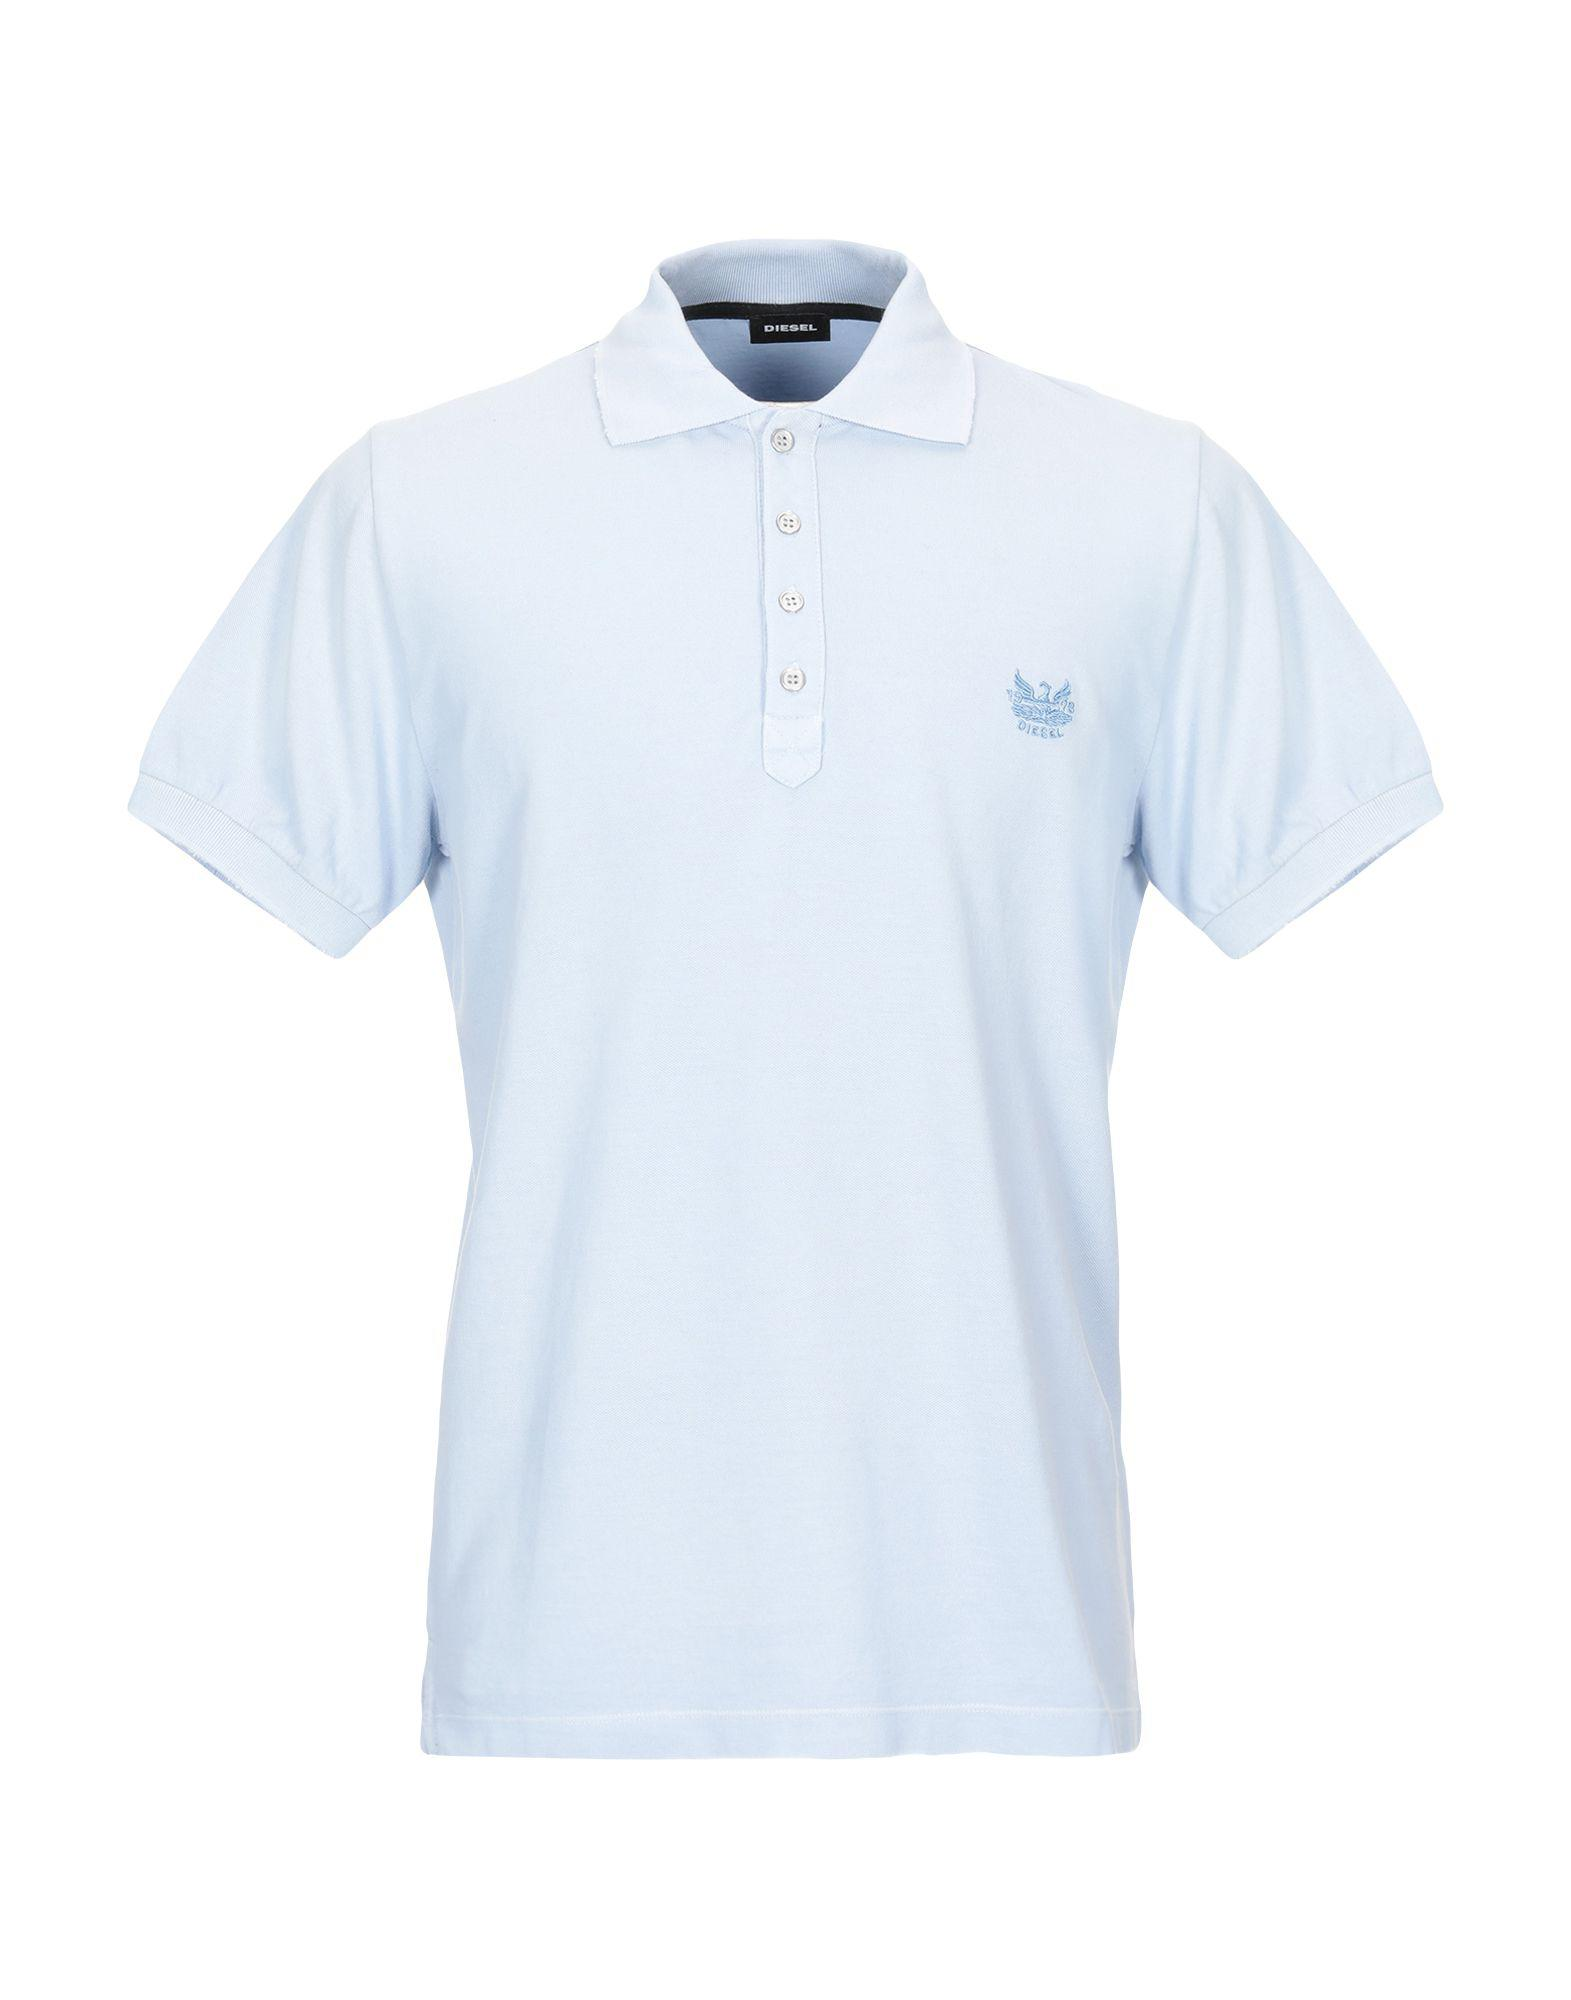 79db45f9 DIESEL - Blue Polo Shirt for Men - Lyst. View fullscreen